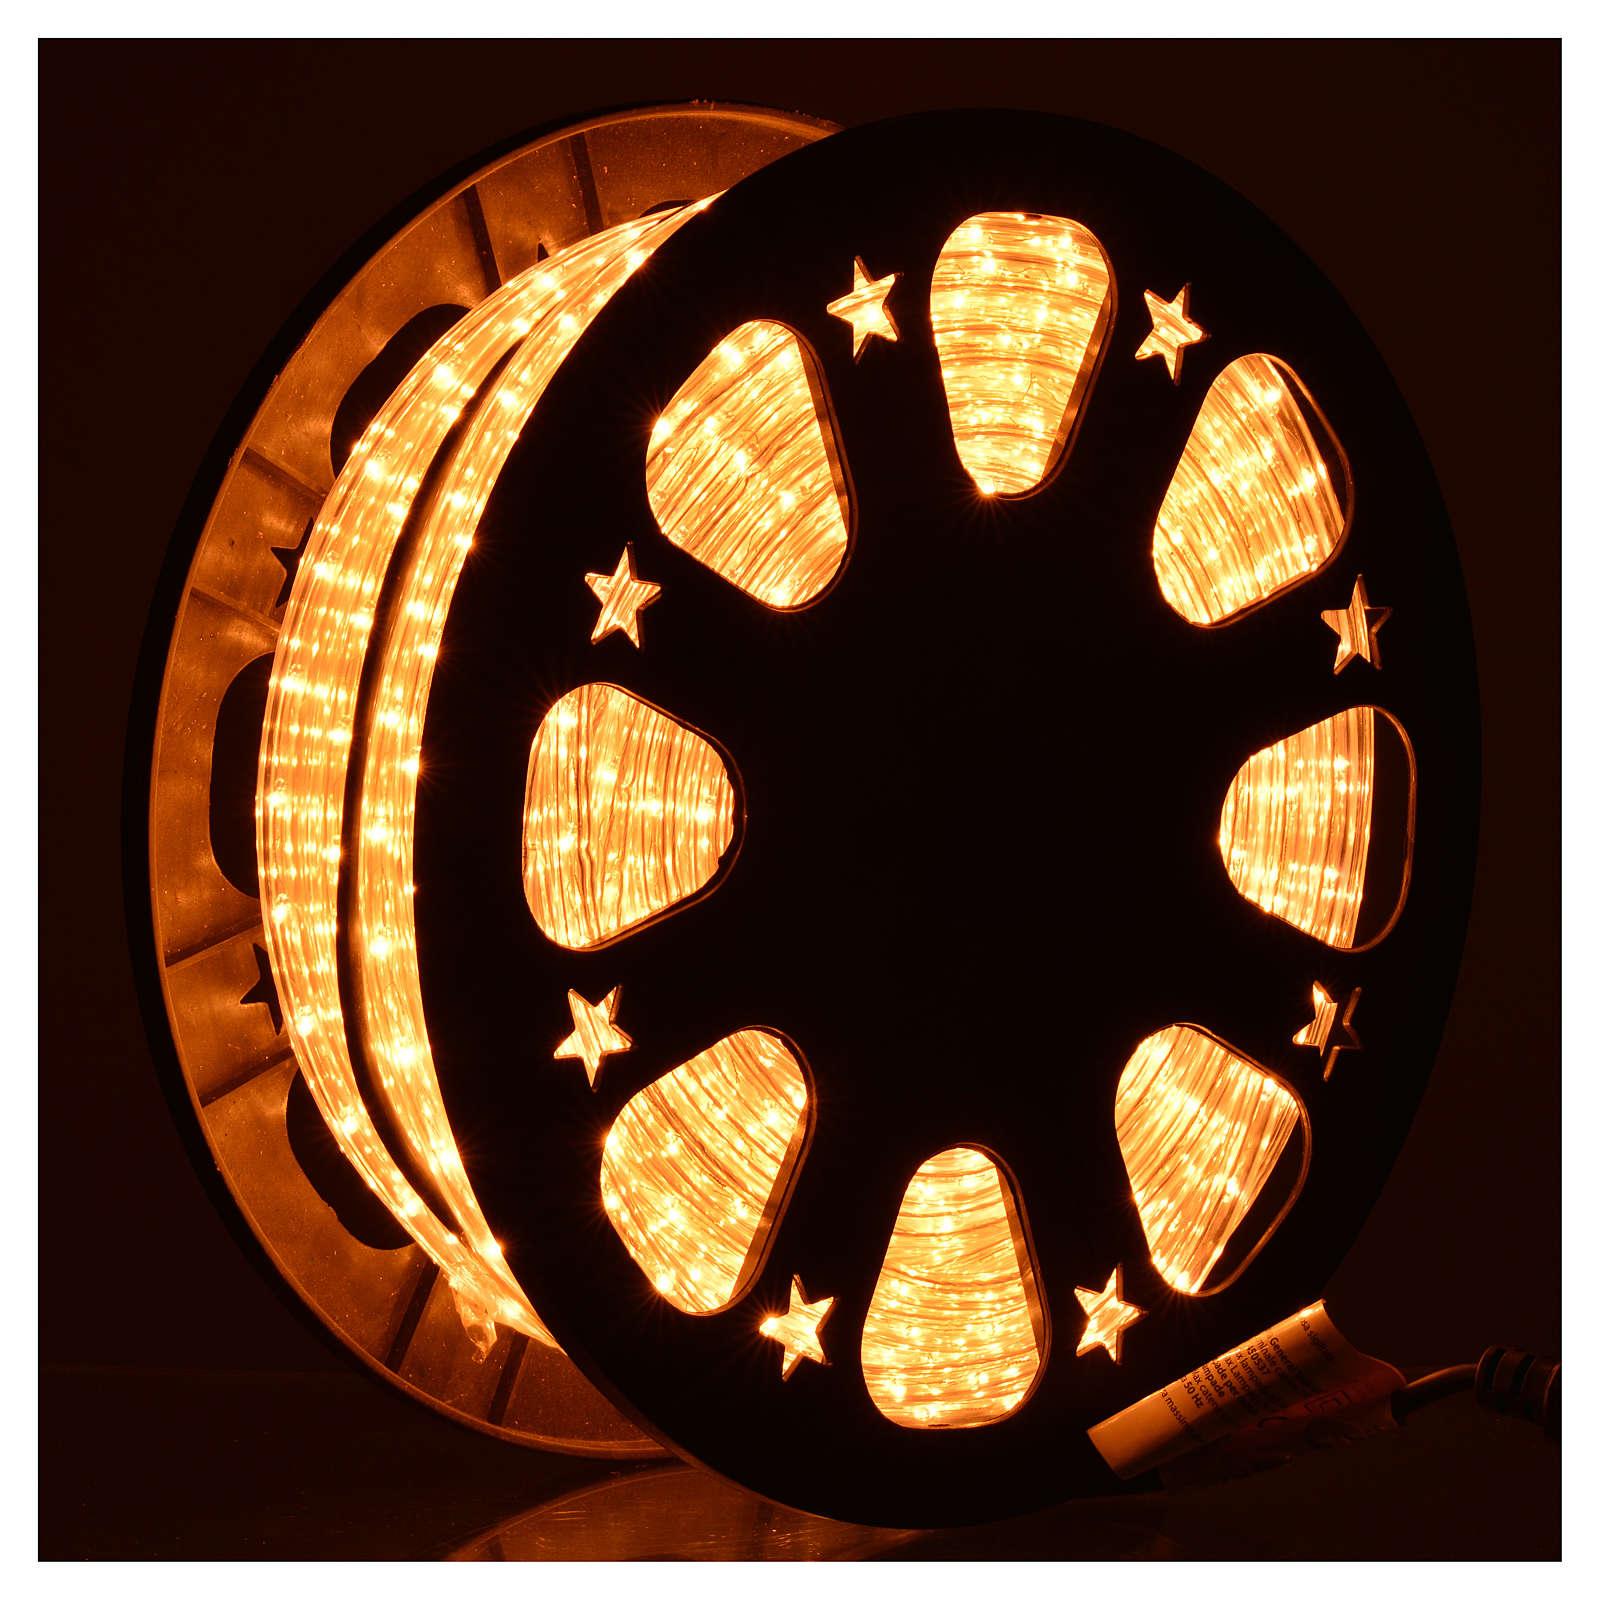 Luce natalizie tubo lux 50 metri per esterno luce chiara 3